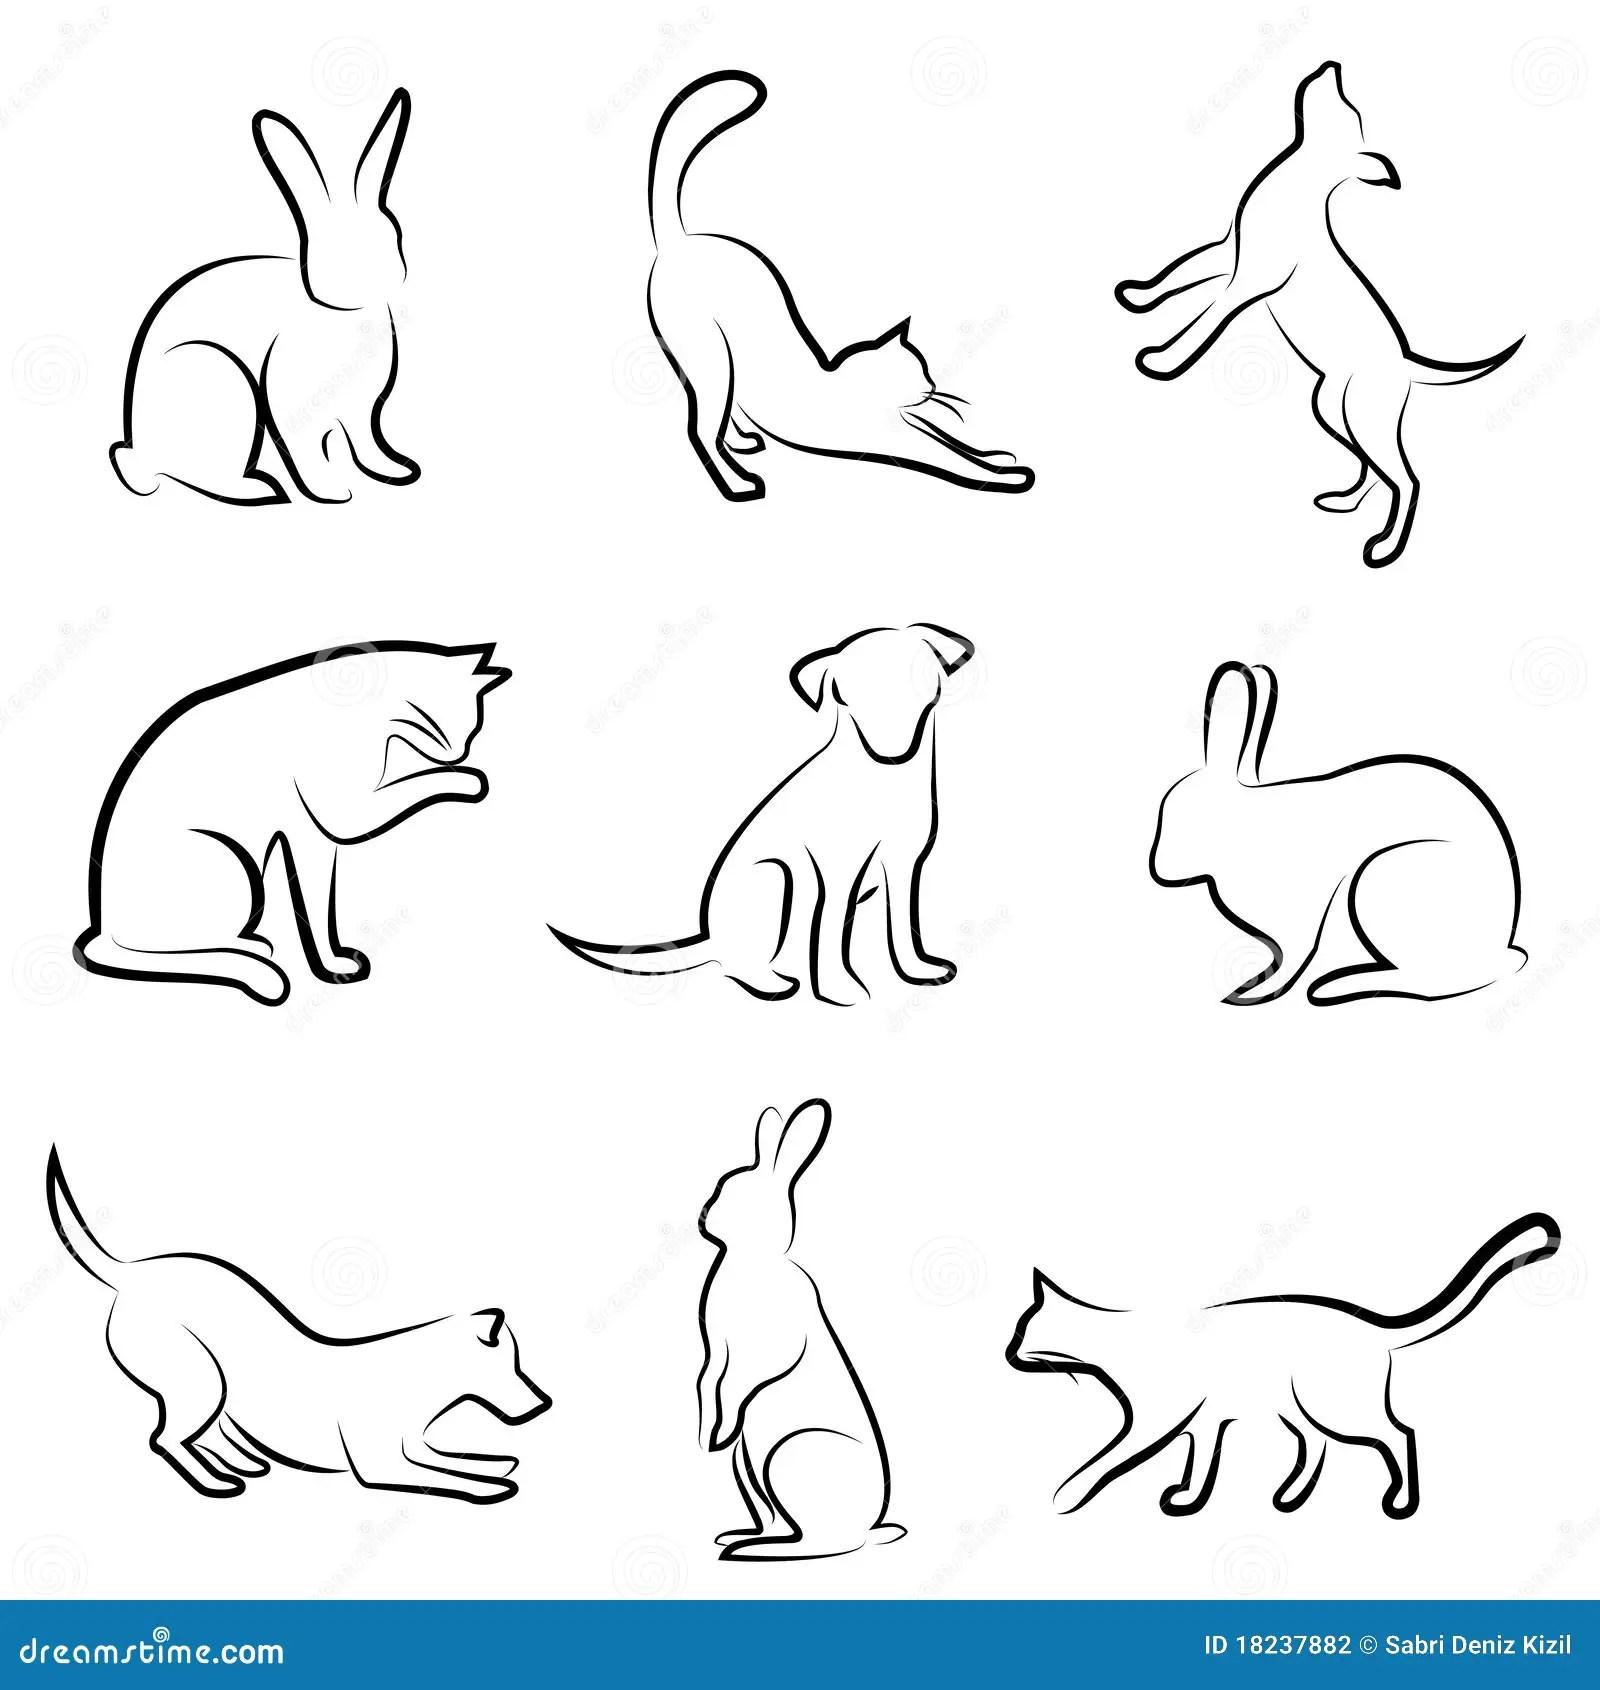 Dog Cat Rabbit Animal Drawing Stock Photography